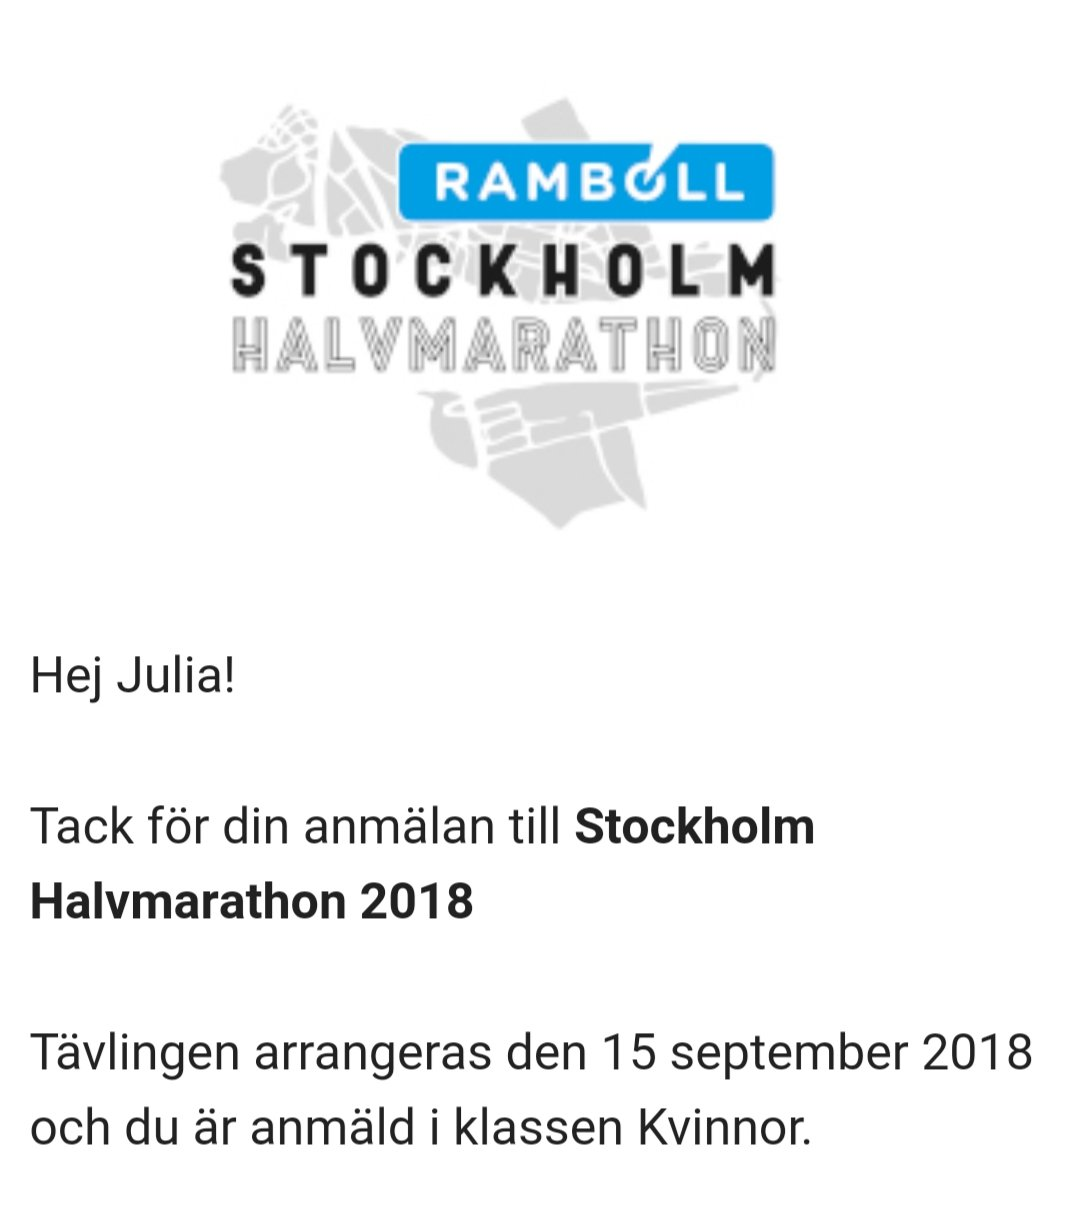 Anmälan till Stockholm halvmarathon